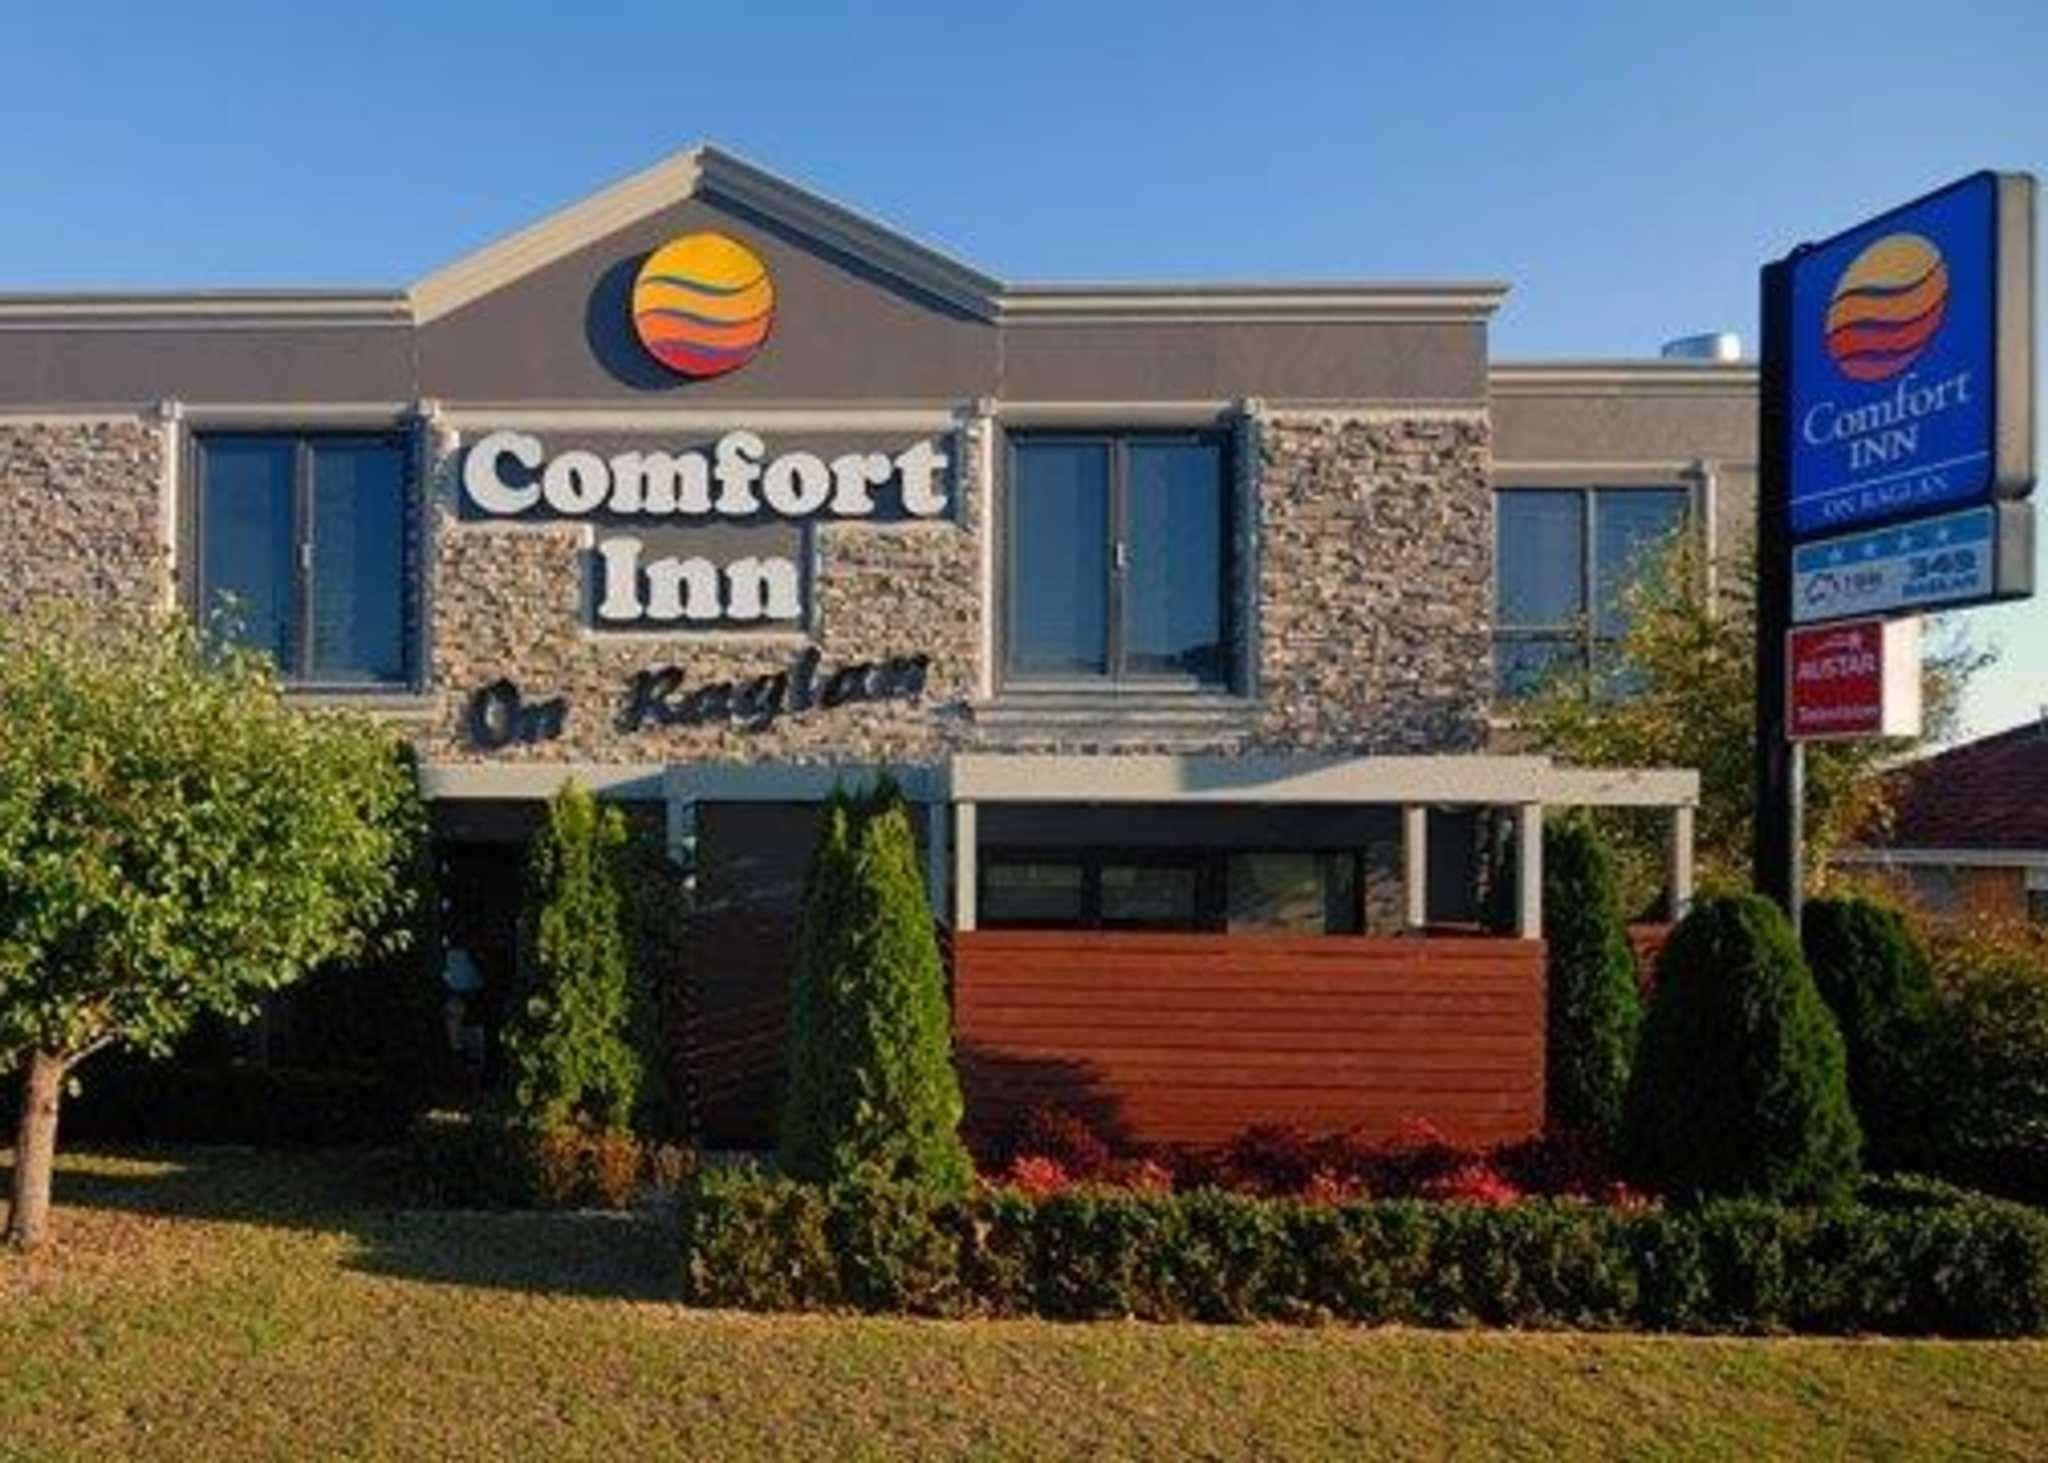 Comfort Inn On Raglan Reviews